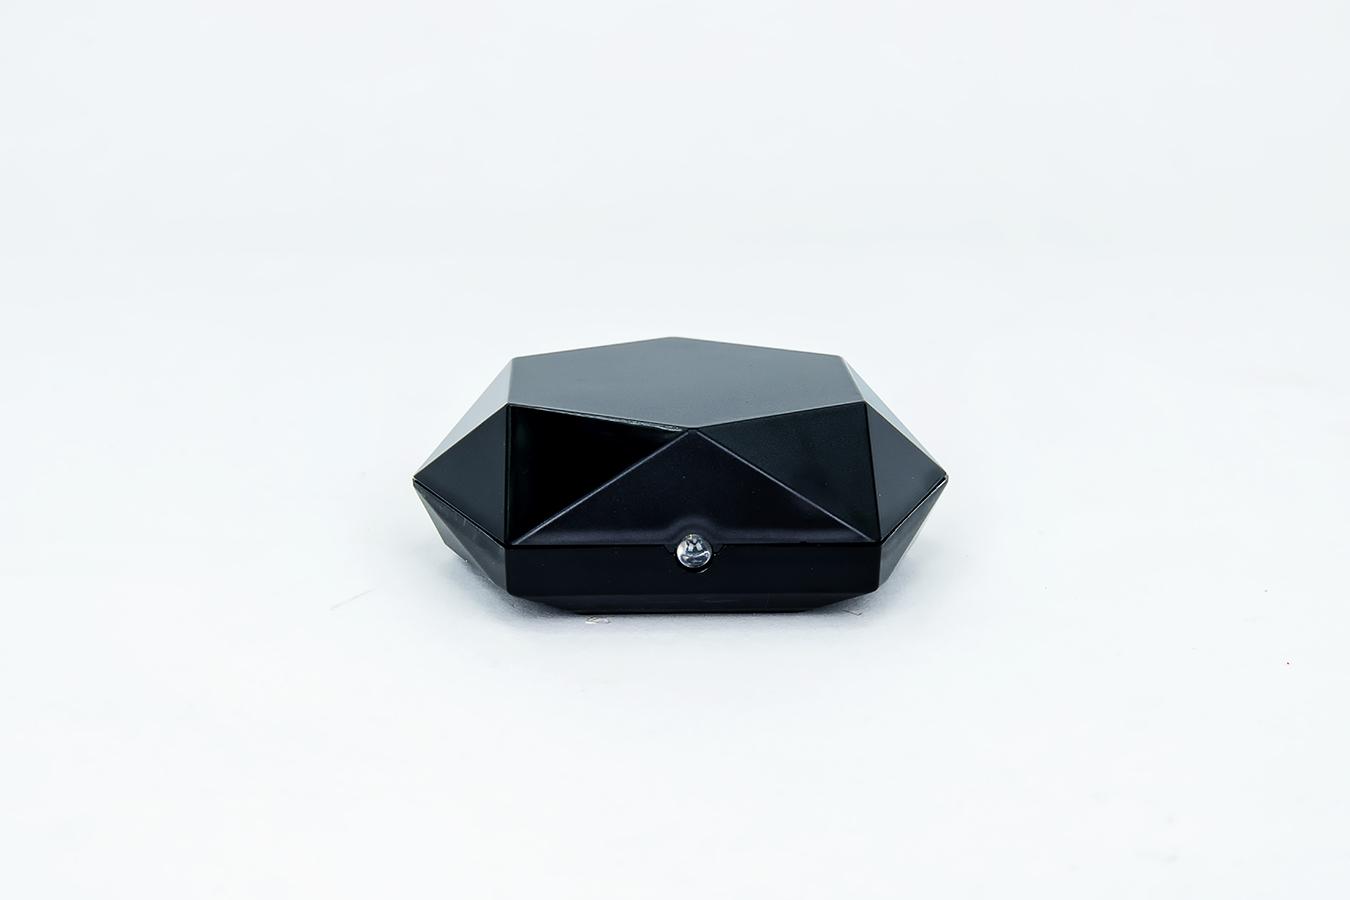 AIFA i-Ctrl 2 smart remote智能遙控器